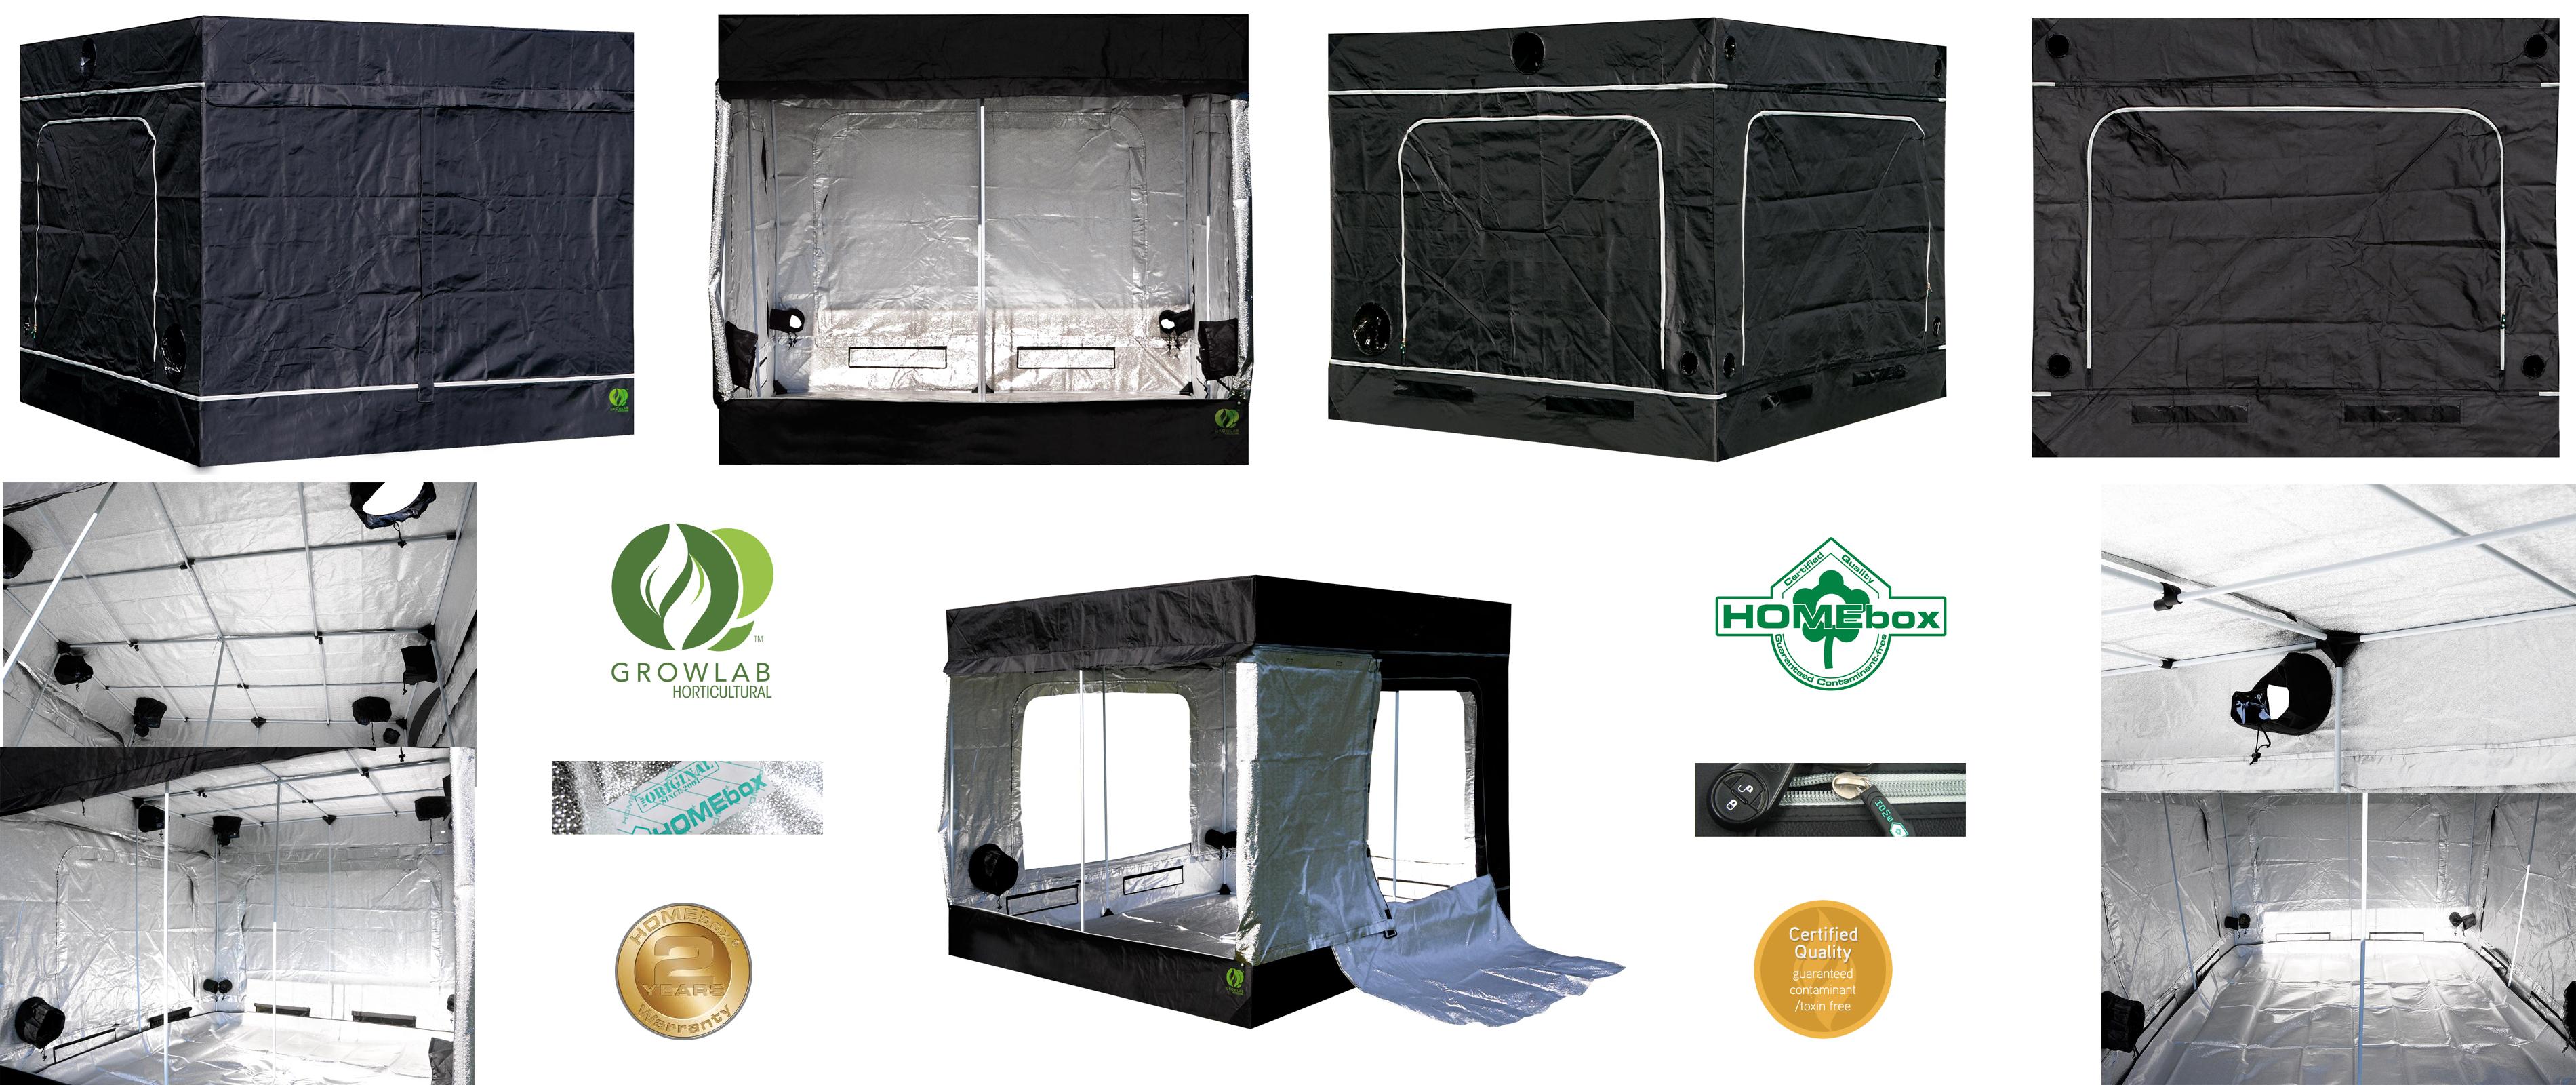 L Vert Tente Growlab Homebox Chambre de culture GrowLab